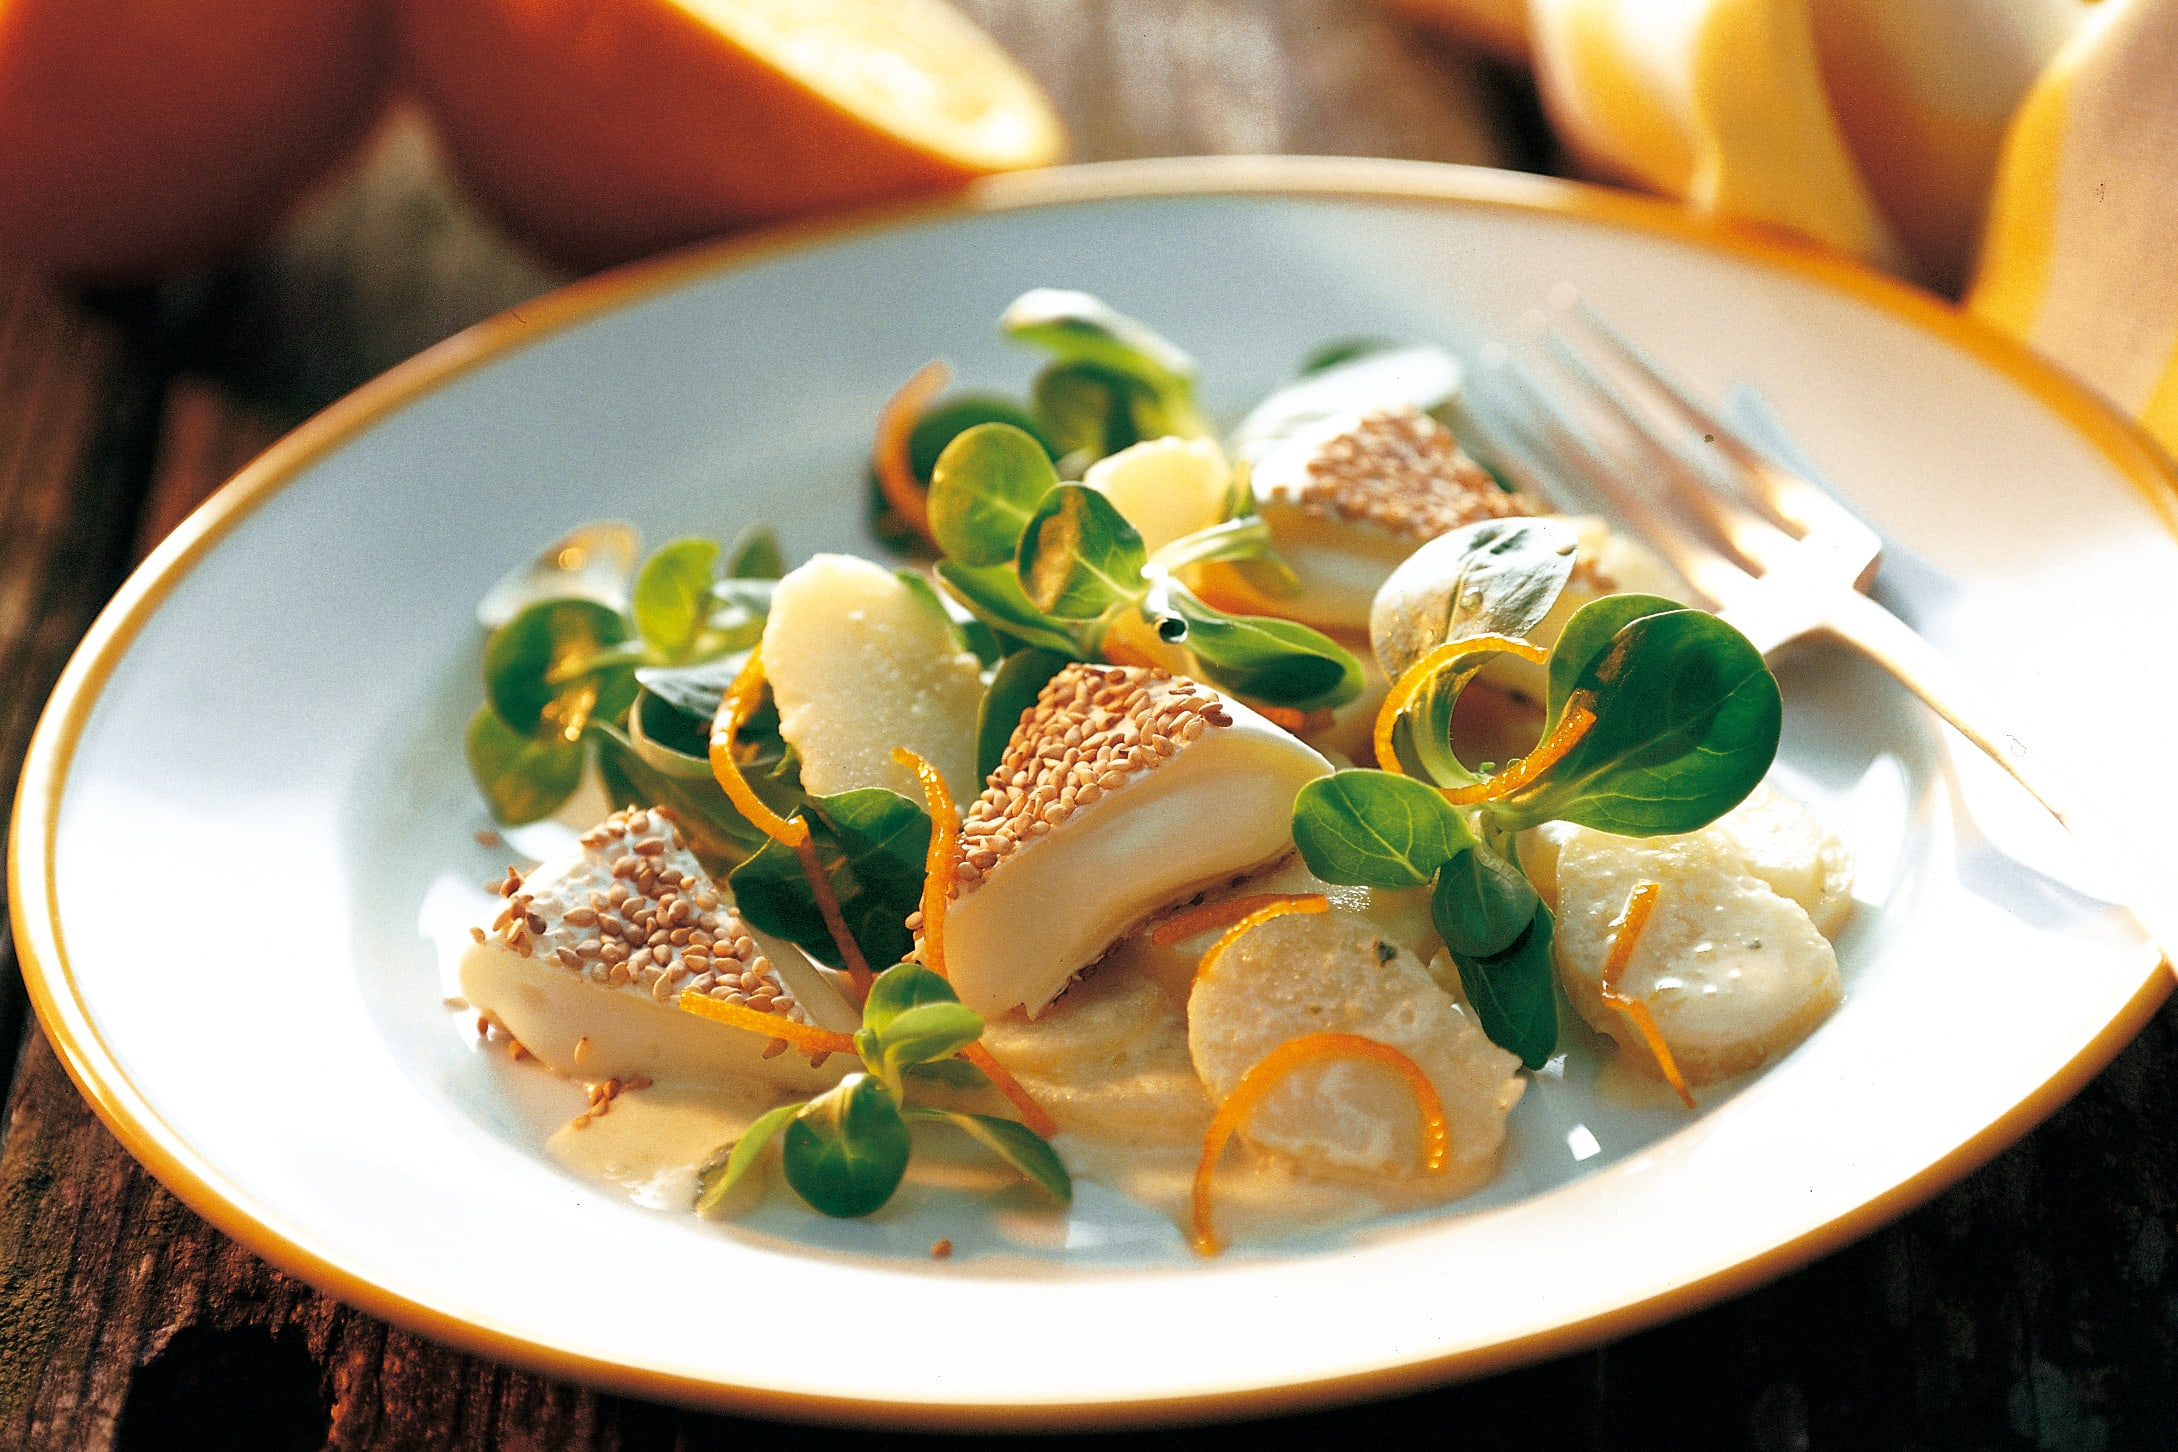 Sesam-Tommes mit Blattsalaten